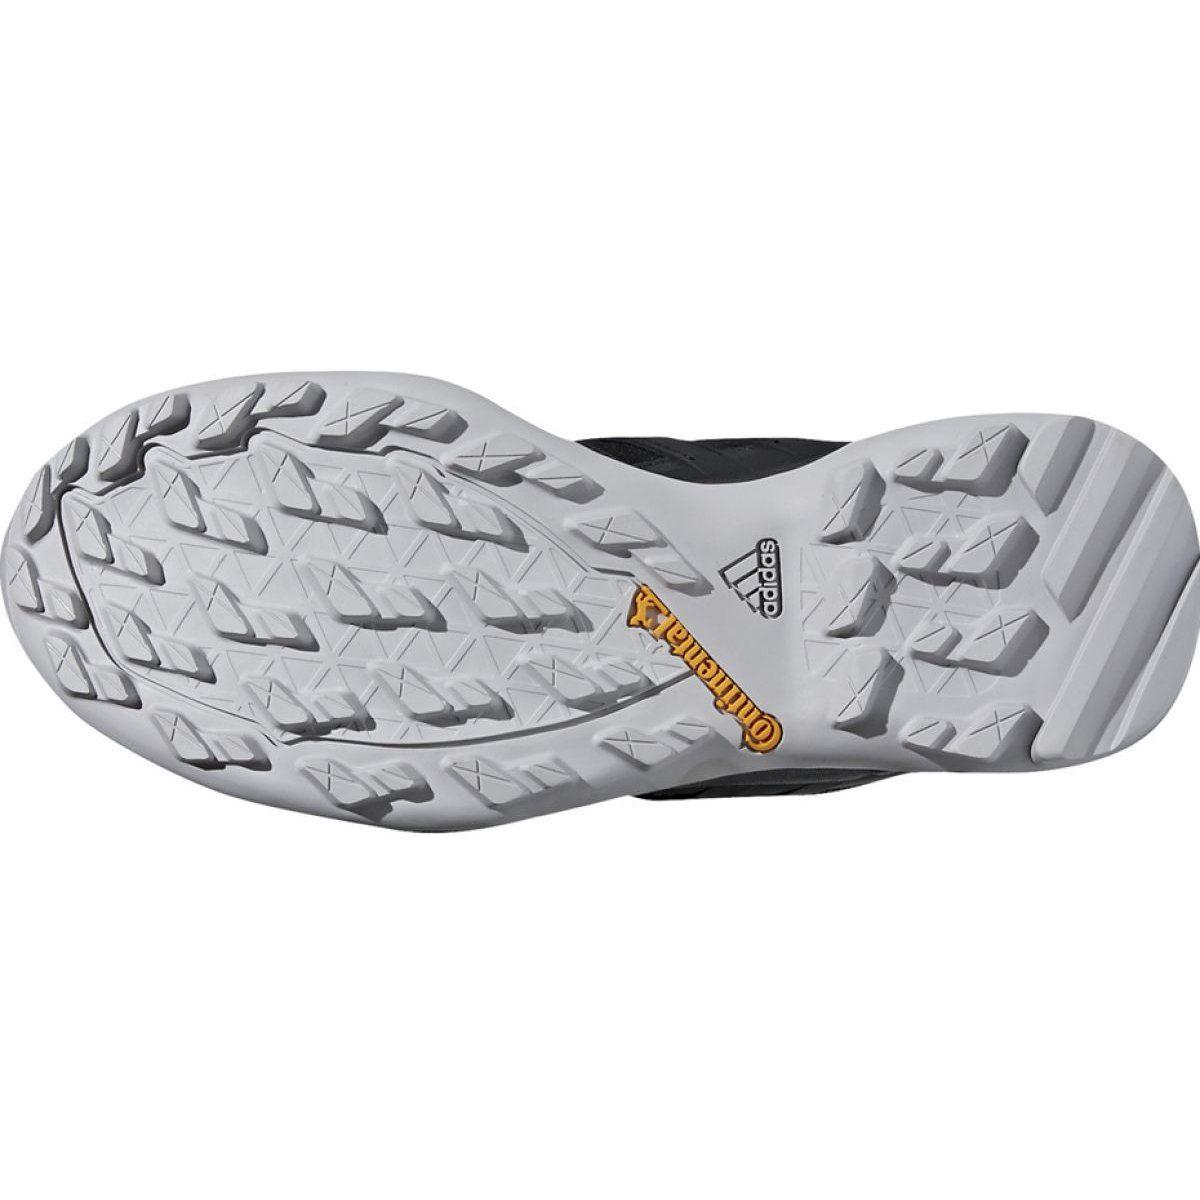 Buty Trekkingowe Adidas Terrex Swift R2 Mid Gtx W Cm7651 Czarne Sports Shoes Adidas Adidas Trekking Shoes